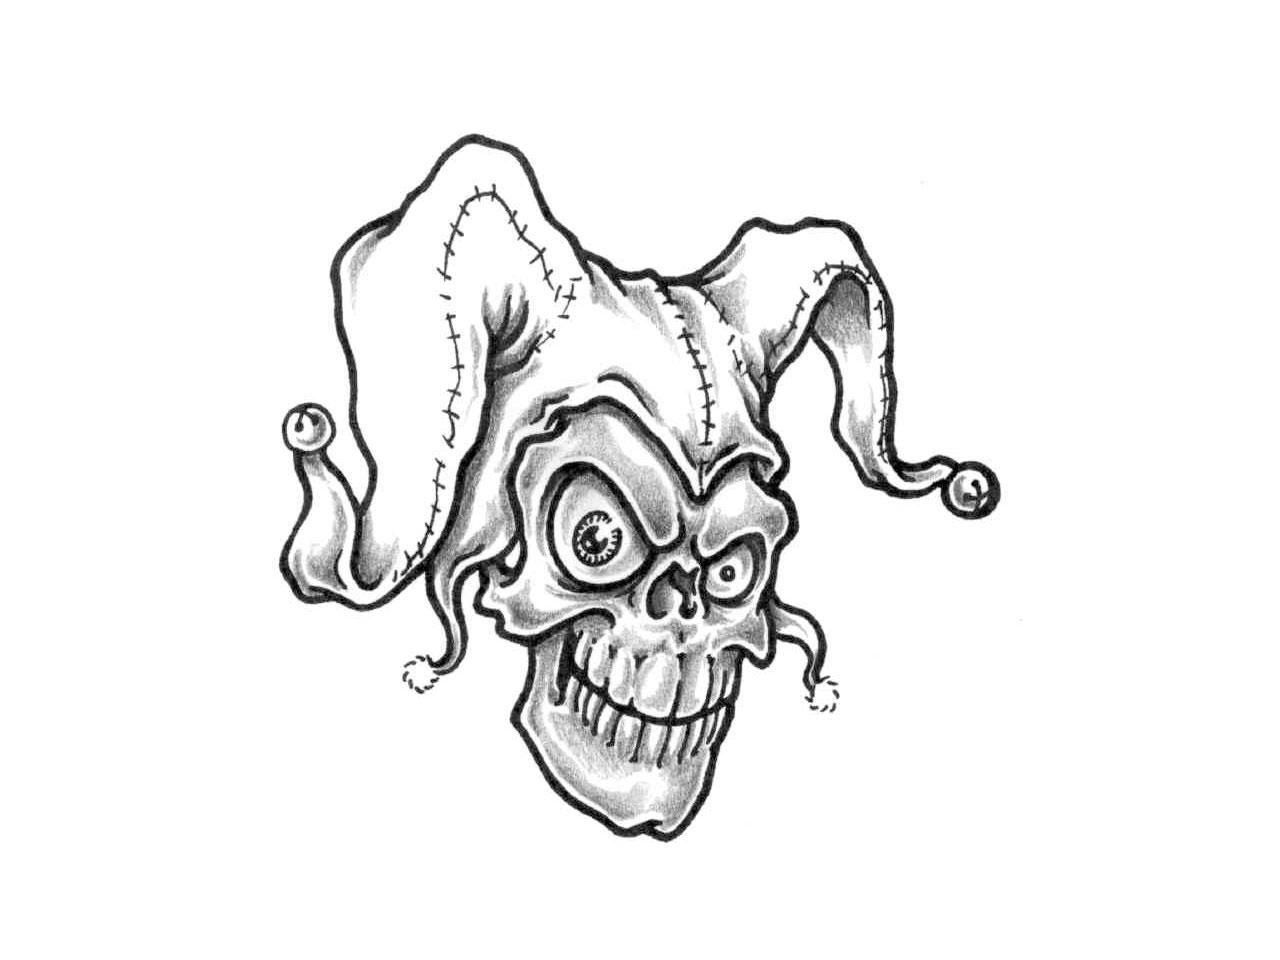 Jokers Faces Drawing At Getdrawings